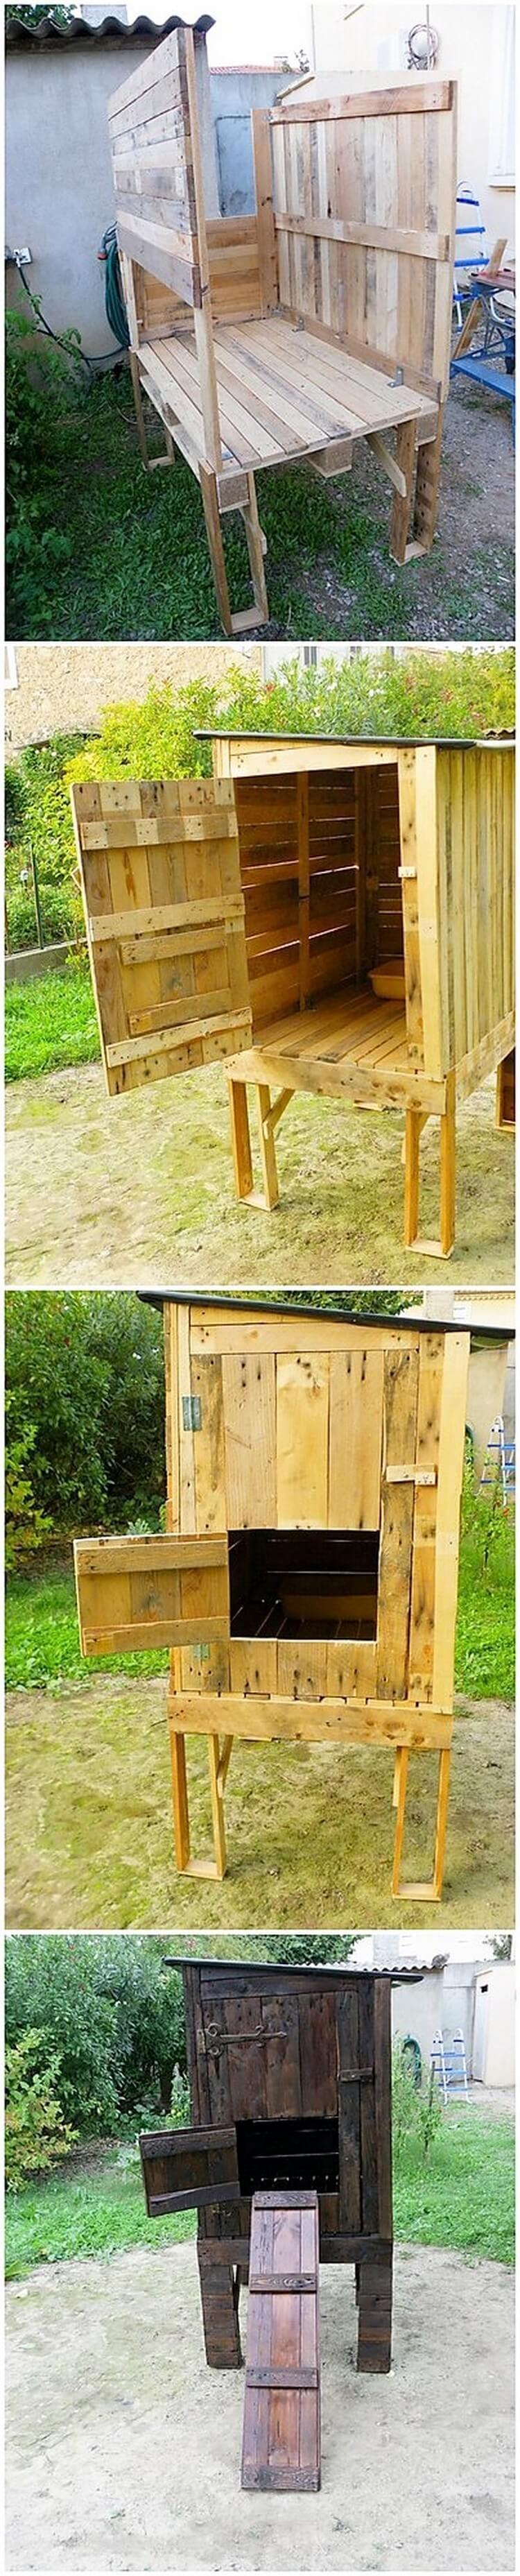 Genius Ways to Recycle Used Wood Pallets   Pallet Wood ...